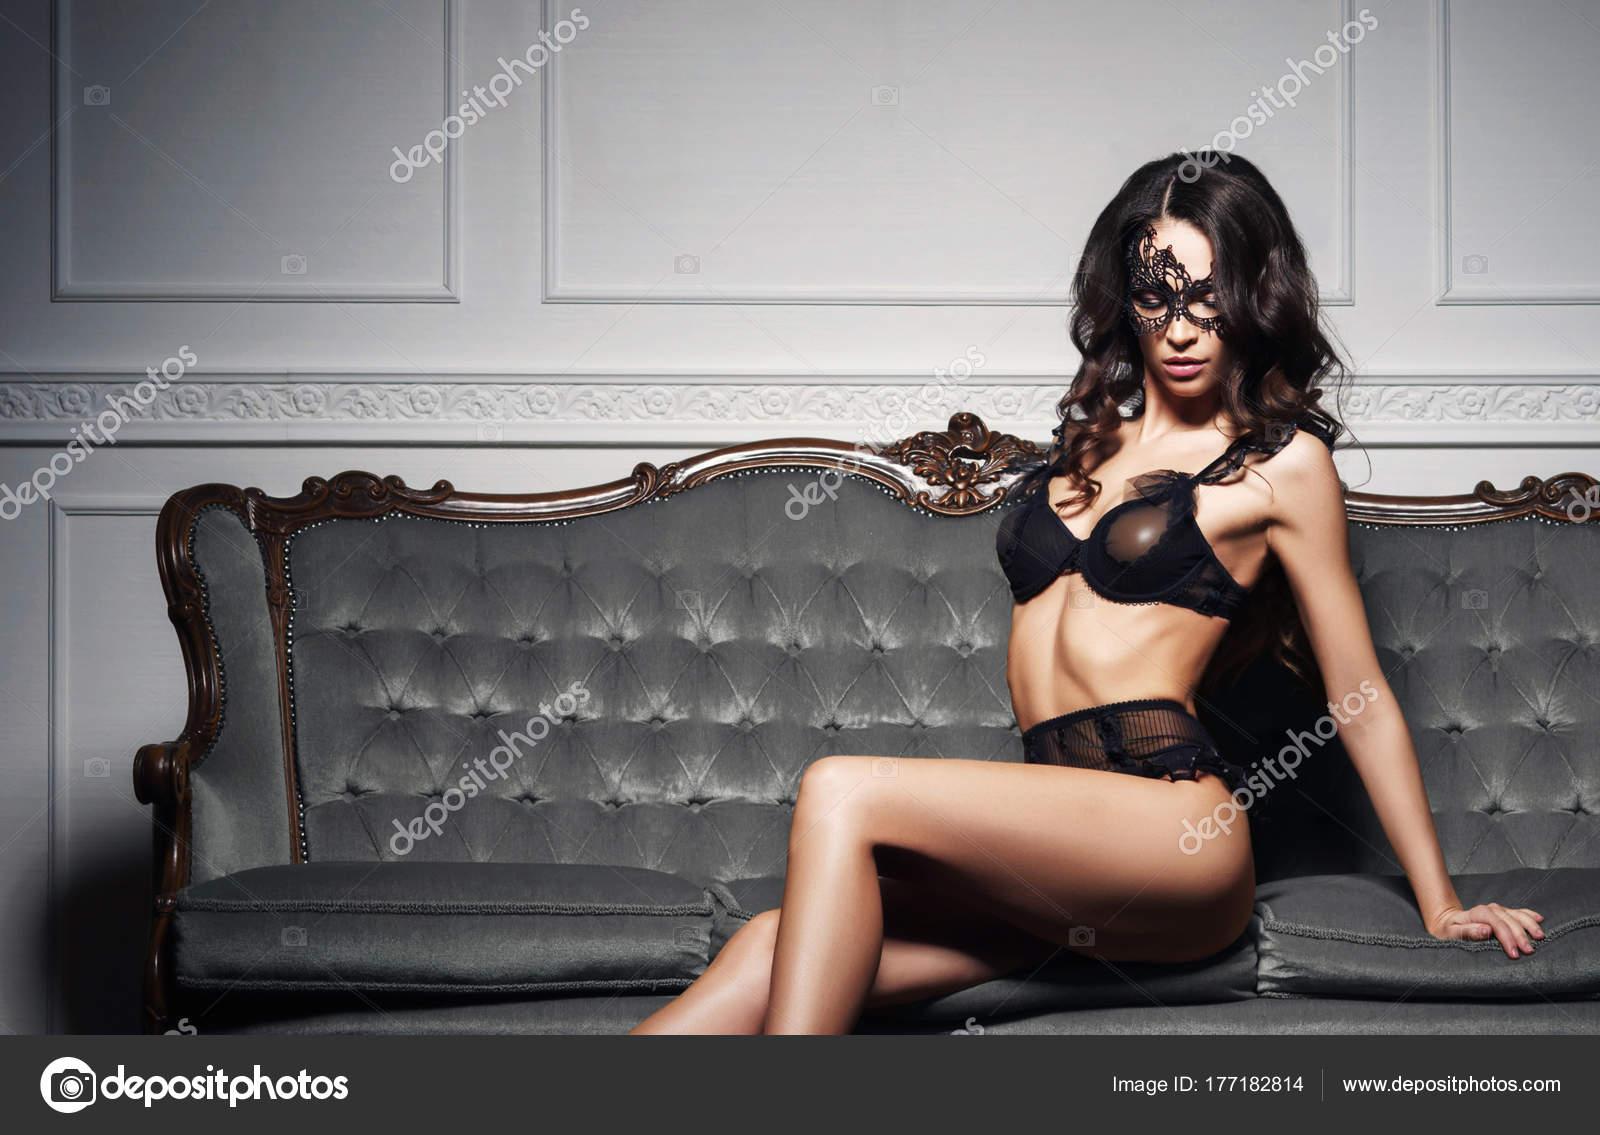 rezinovim-muzhikom-eroticheskie-foto-devushki-bryunetki